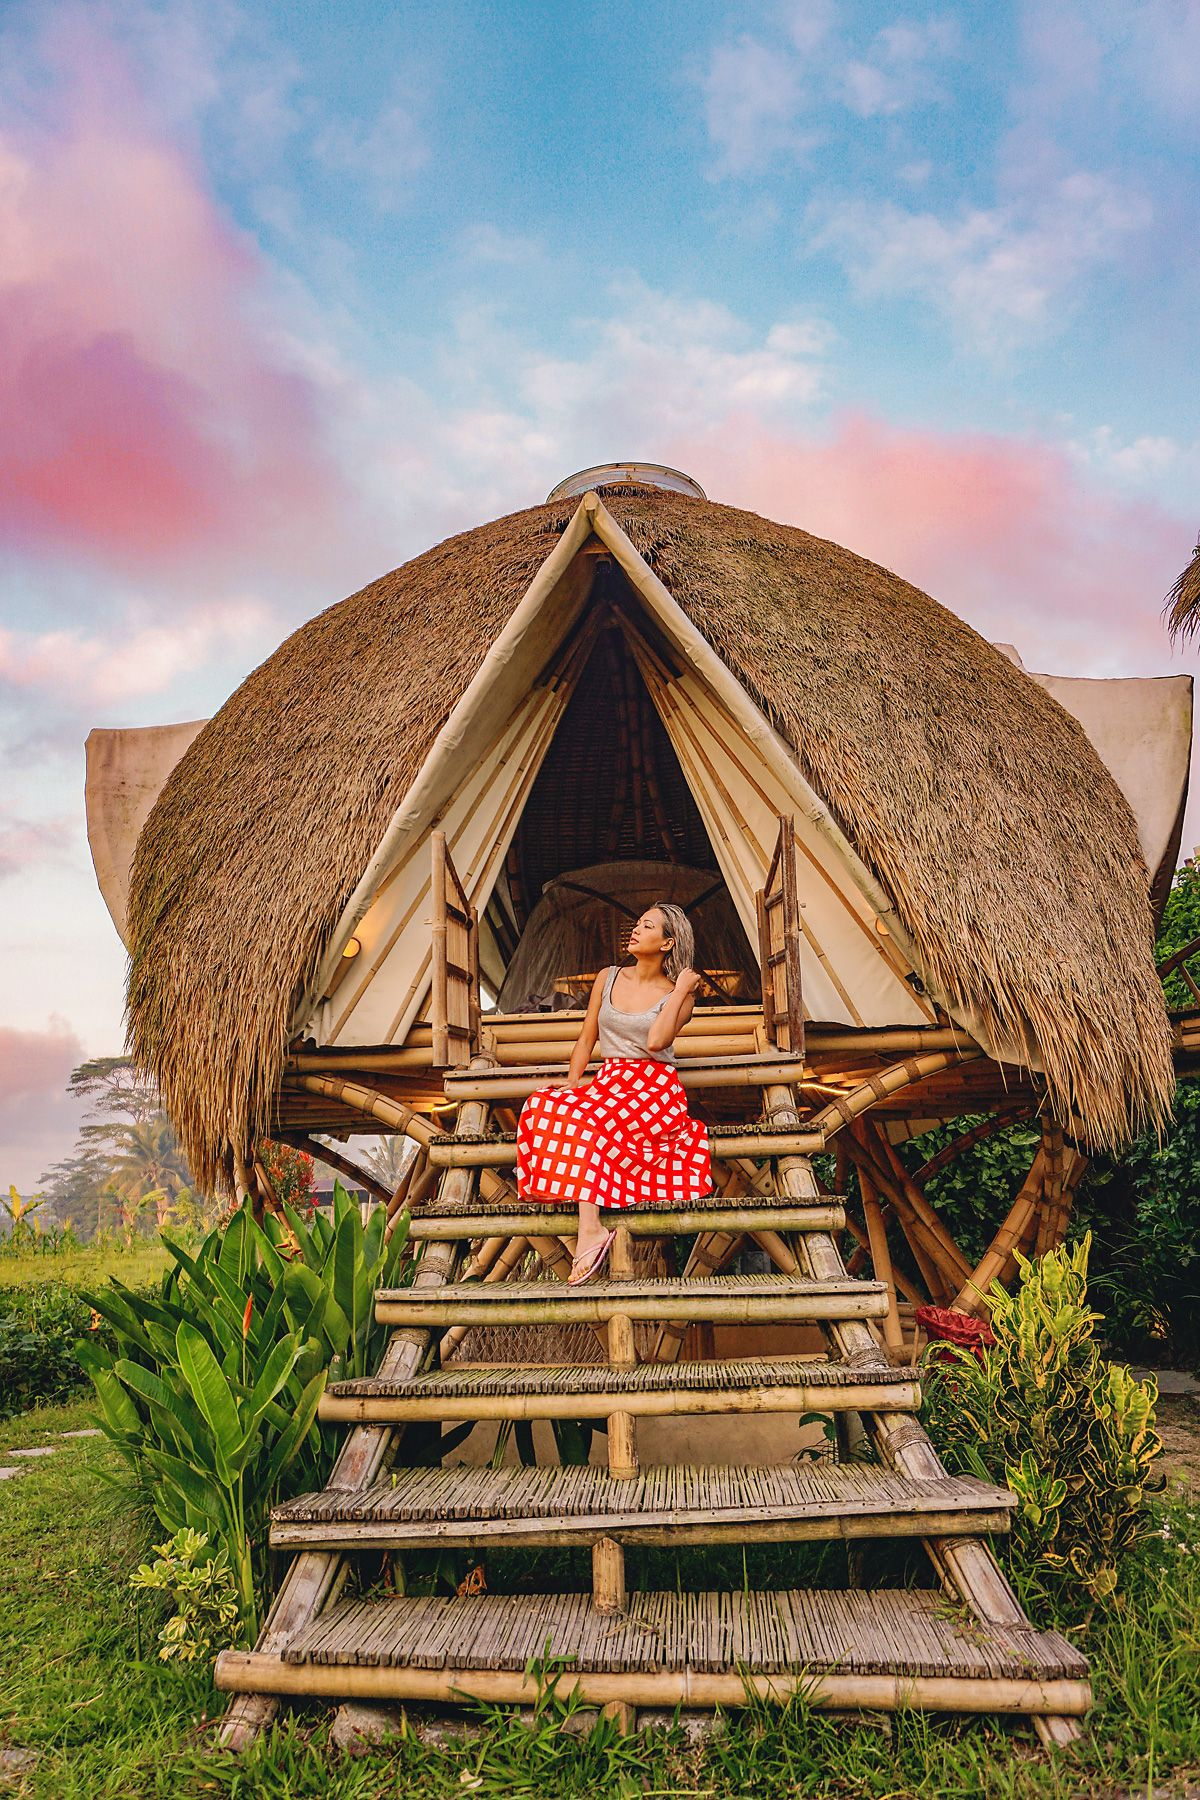 Bali 10 nights Itinerary, Places to visit in Bali, BHLM Bali, Ubud ...